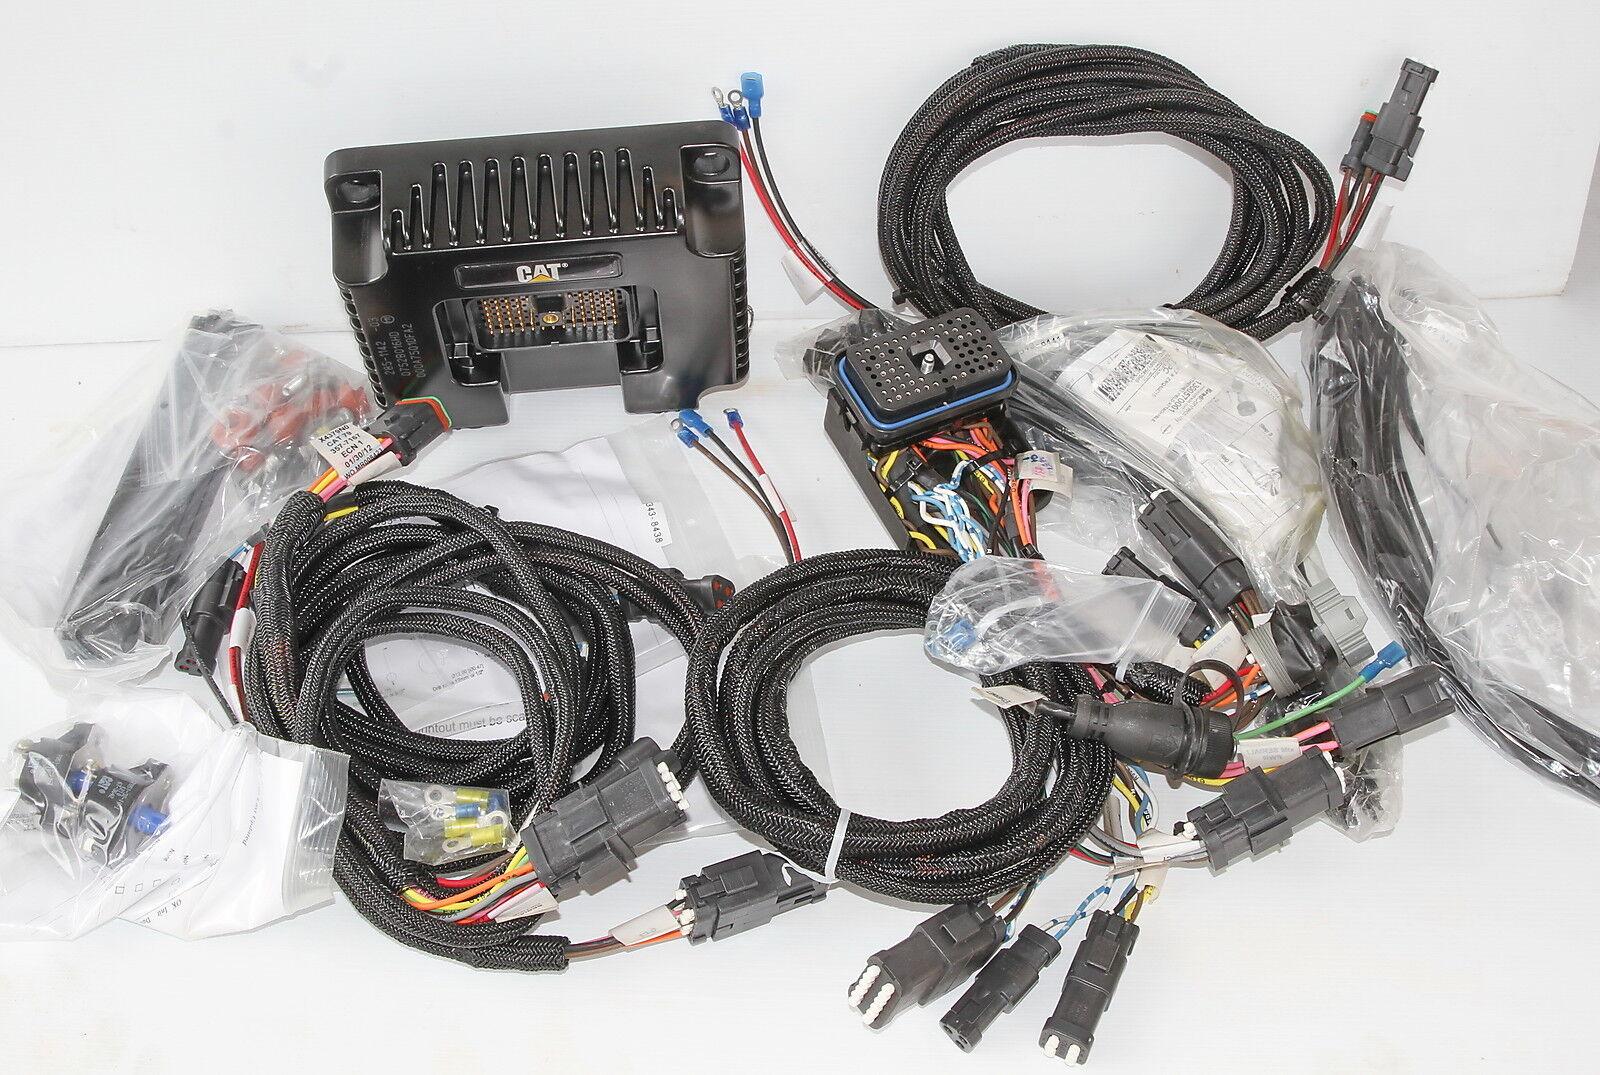 Caterpillar 2851142 Minestar Gp Health Intec Mod Cat Install Kit Ebay Sca Engine Wiring Harness Norton Secured Powered By Verisign